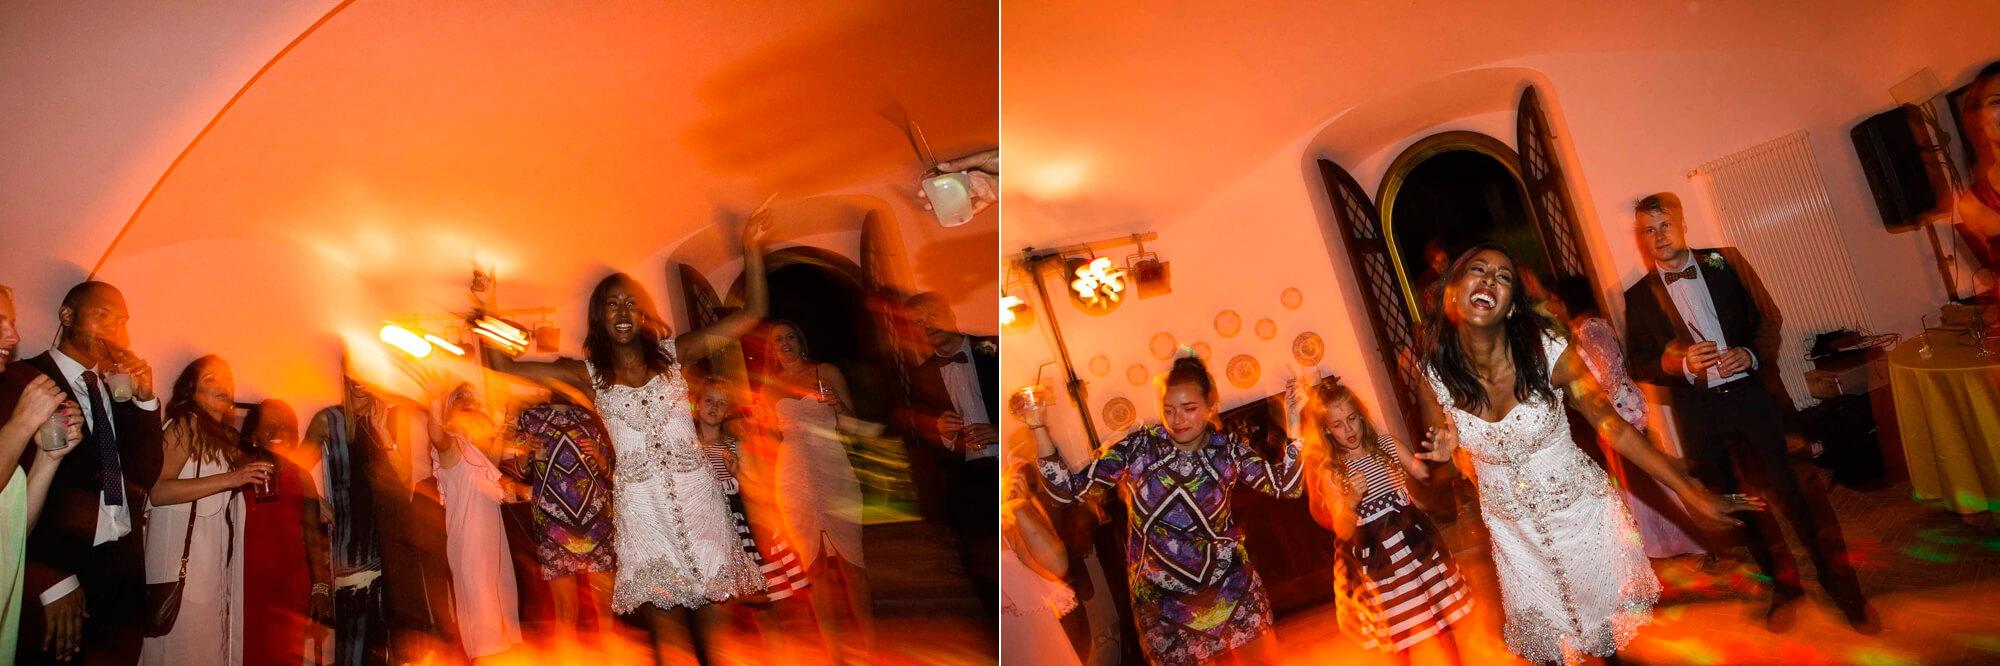 177-sorrento-wedding-photographer.jpg